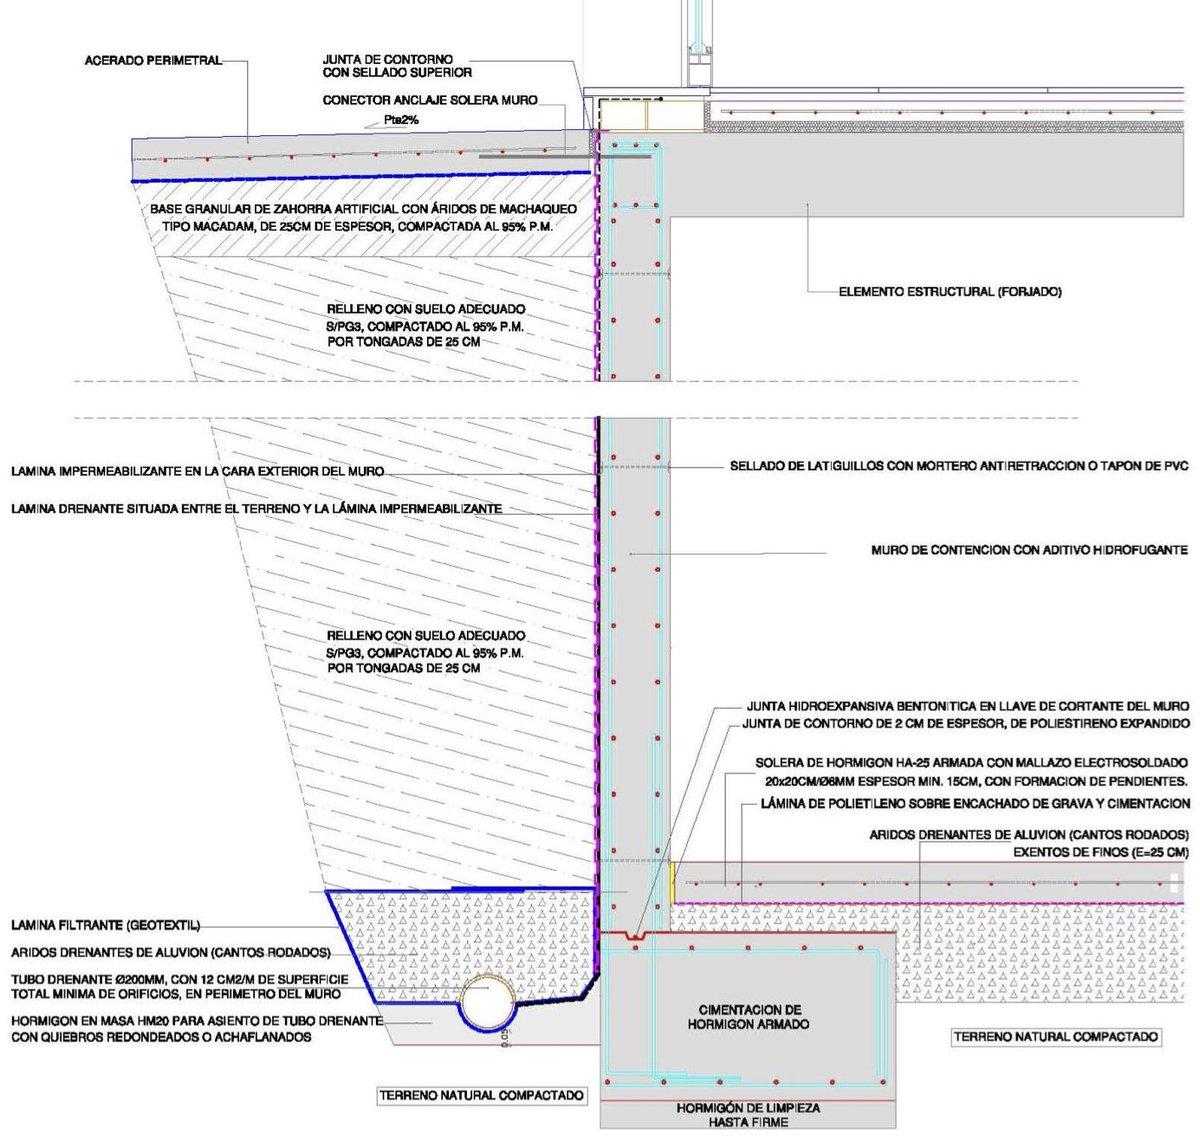 Fundaci n musaat on twitter detalle constructivo - Muro de agua ...